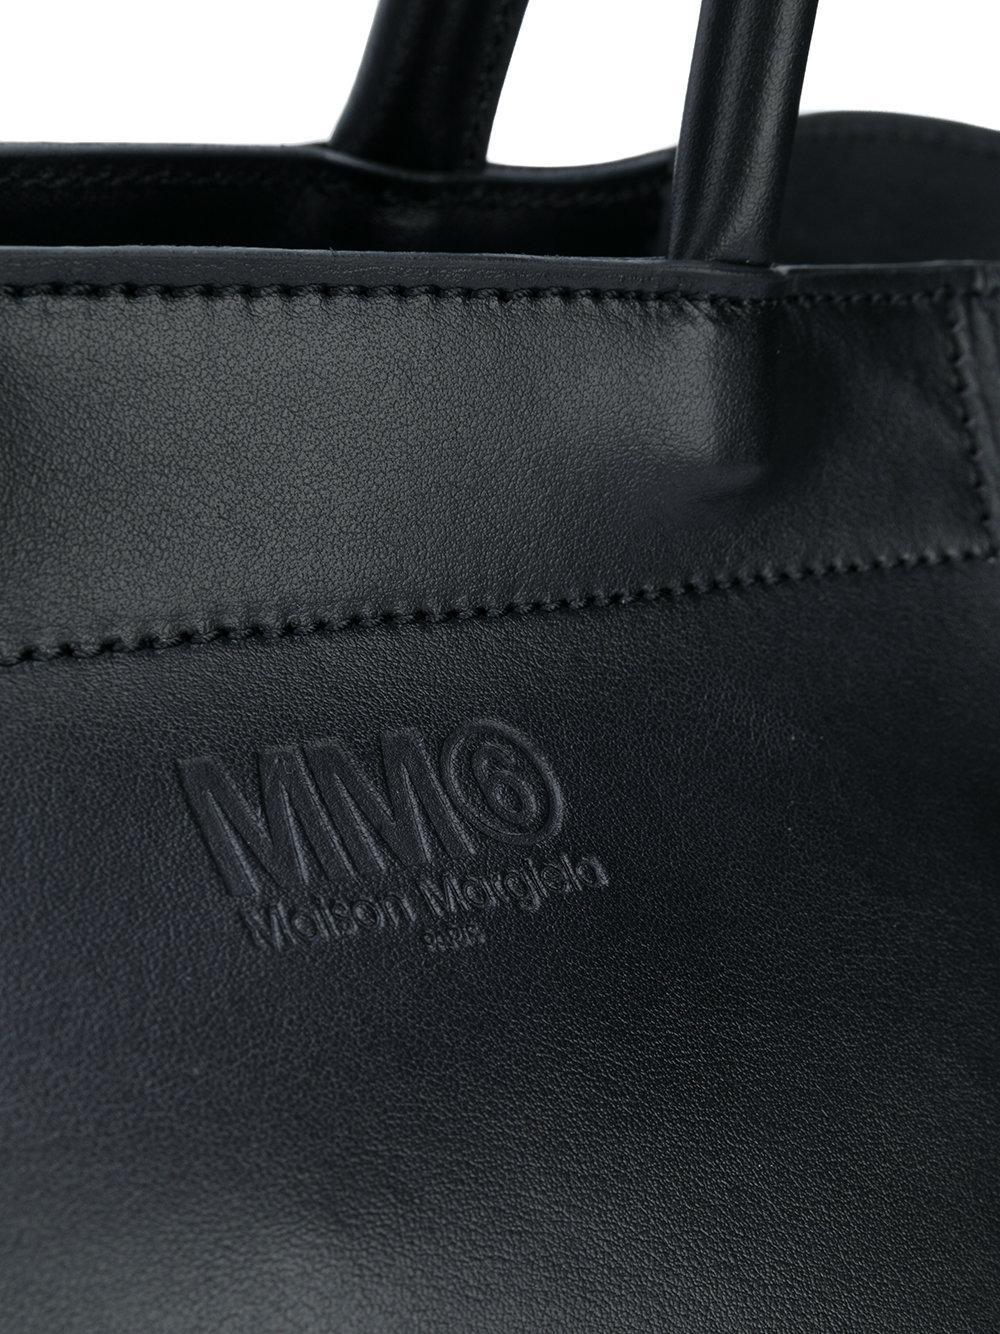 Alfa mini bag - Black Maison Martin Margiela QhAbW